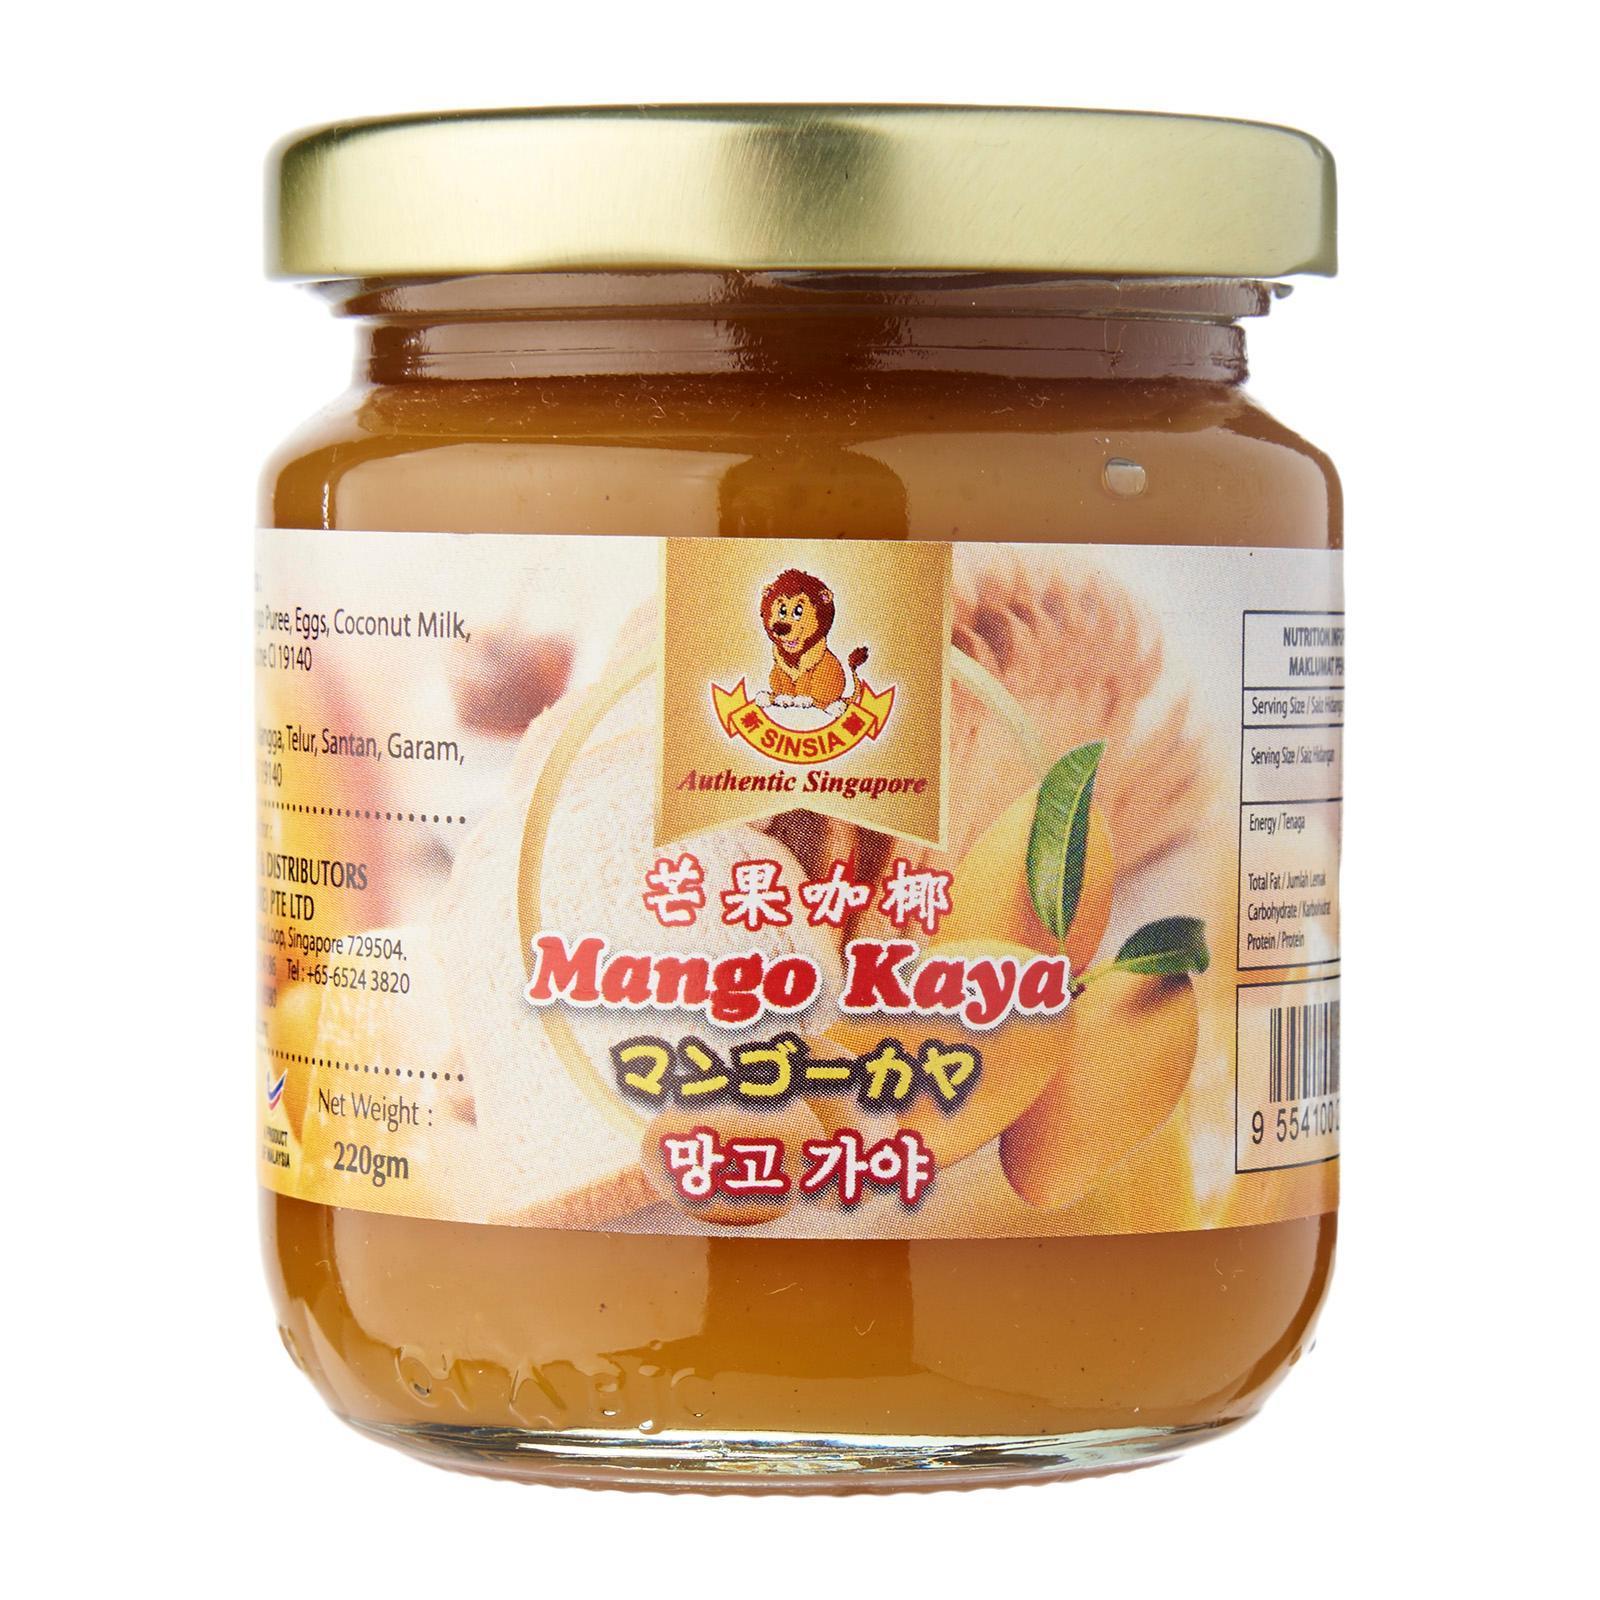 Sinsia Mango Kaya Bottle Jam By Redmart.